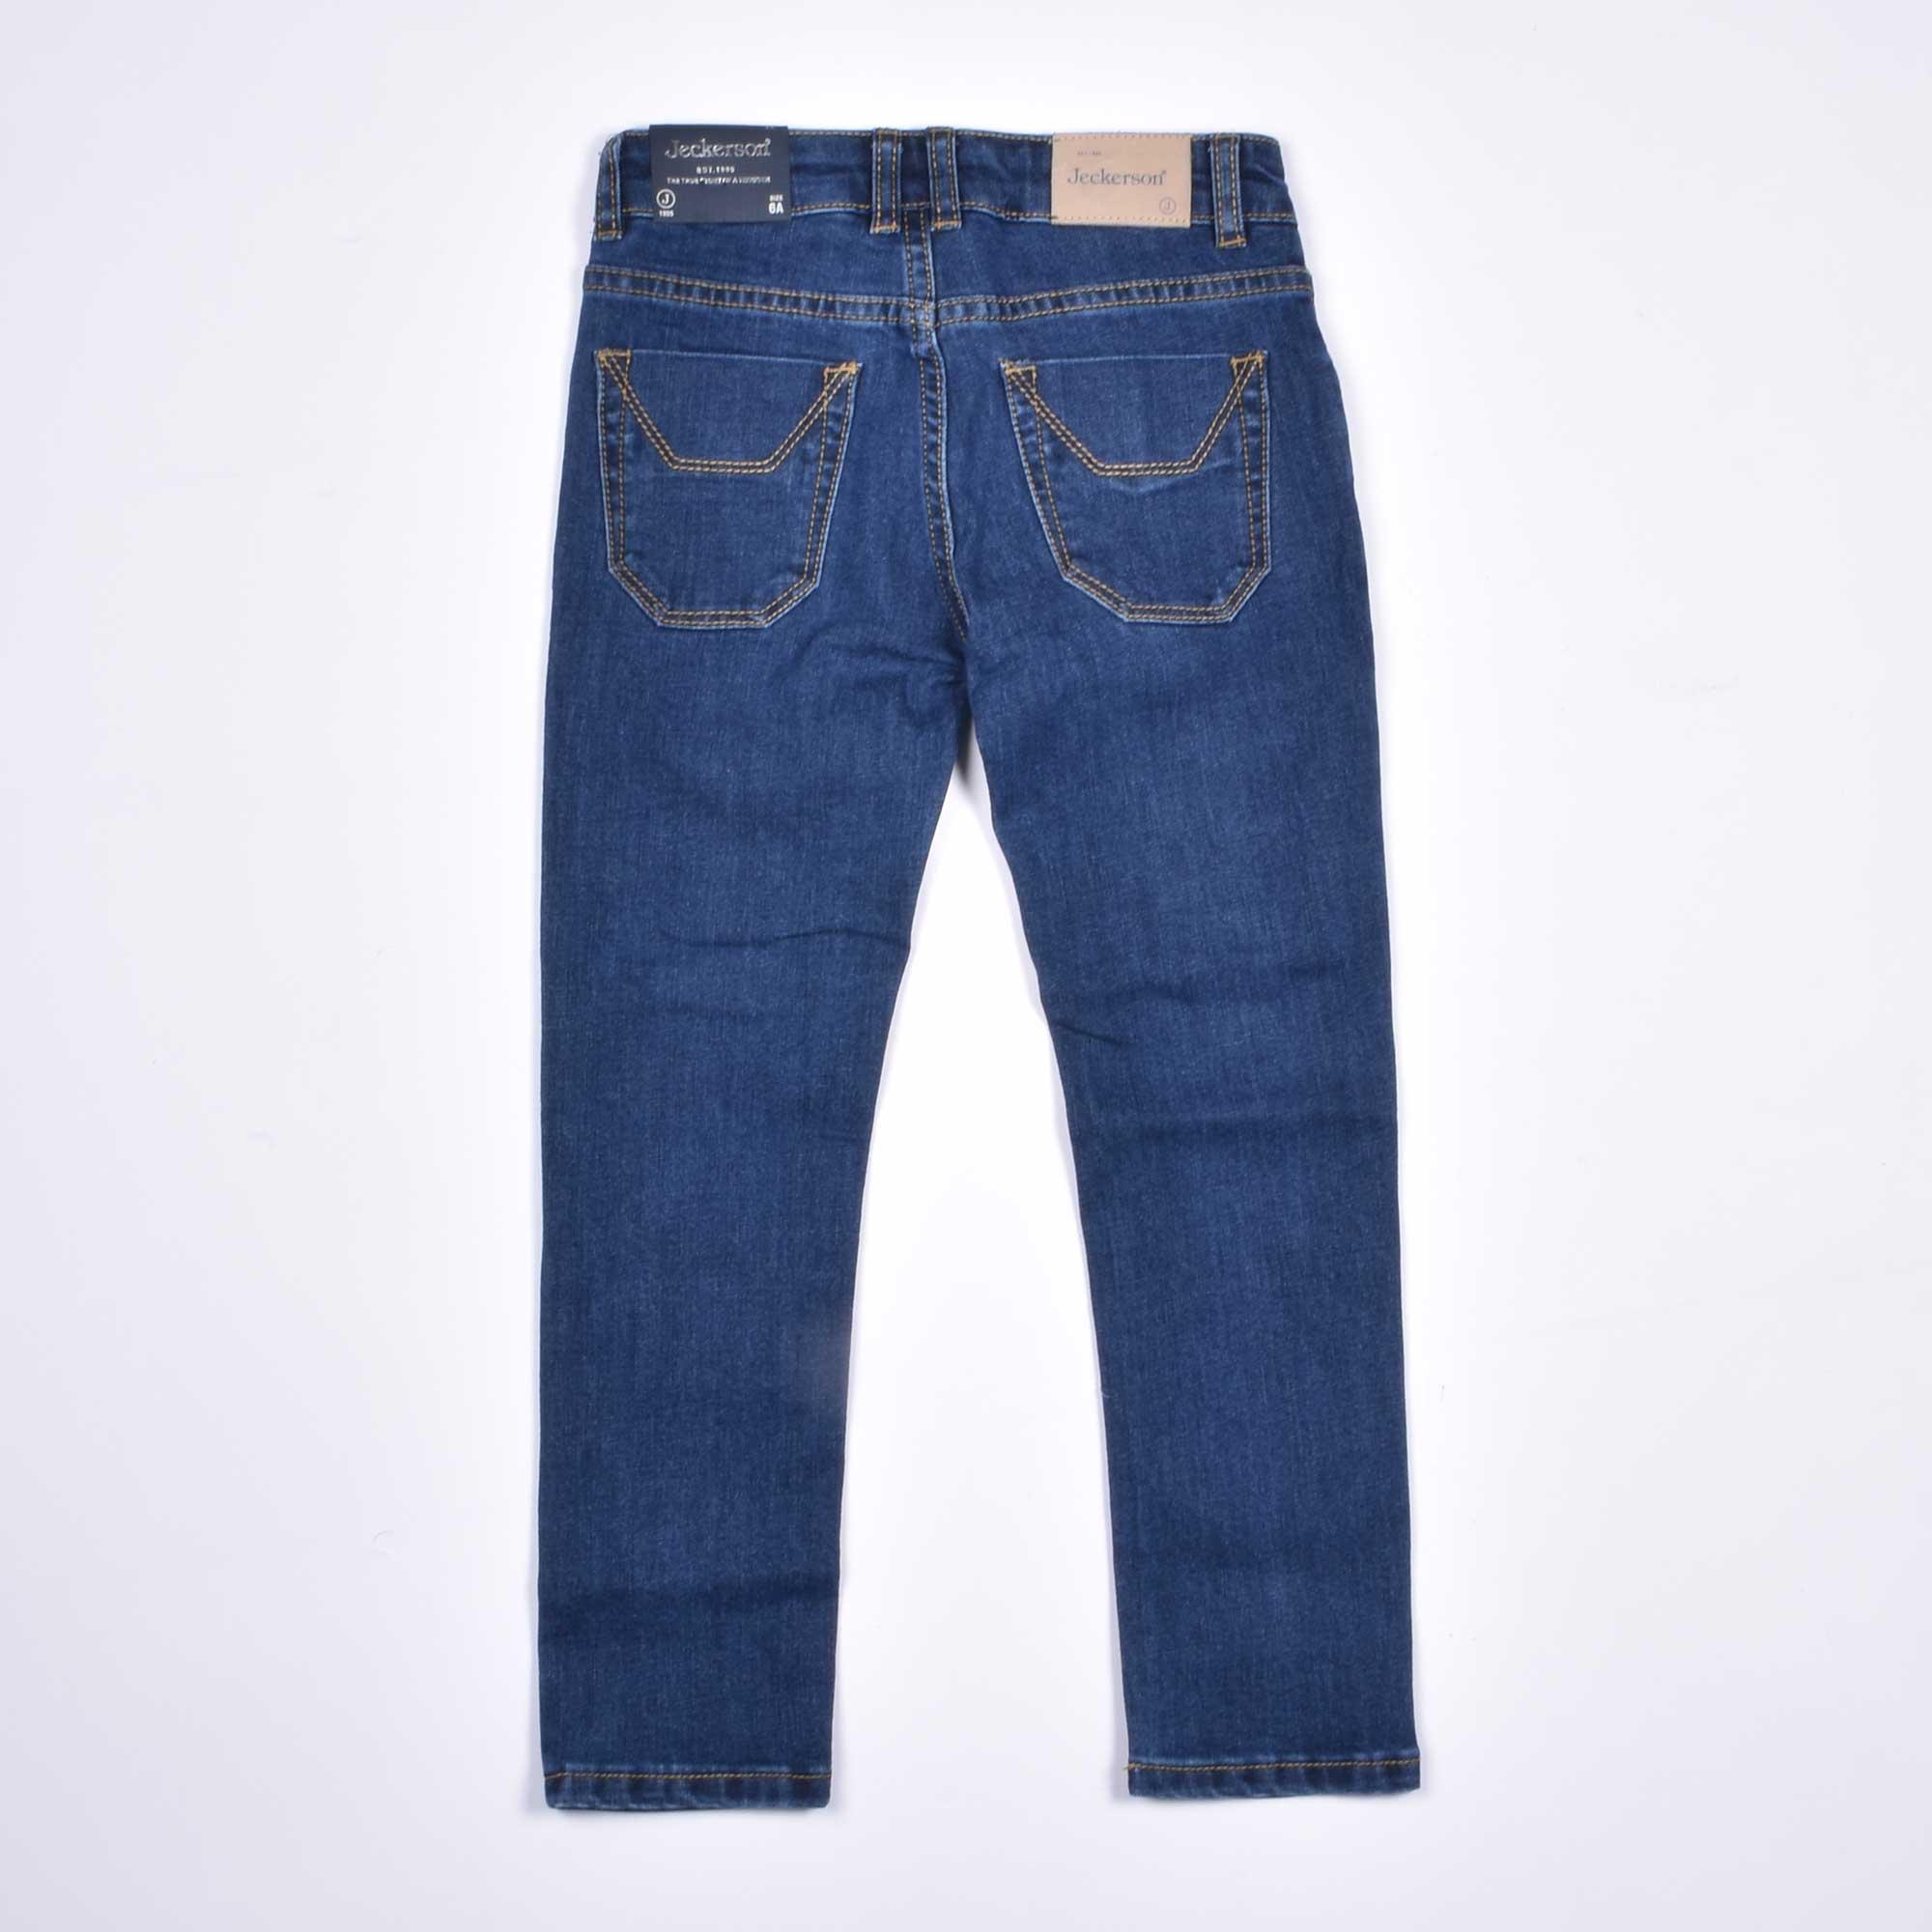 Jeans toppa america - Denim